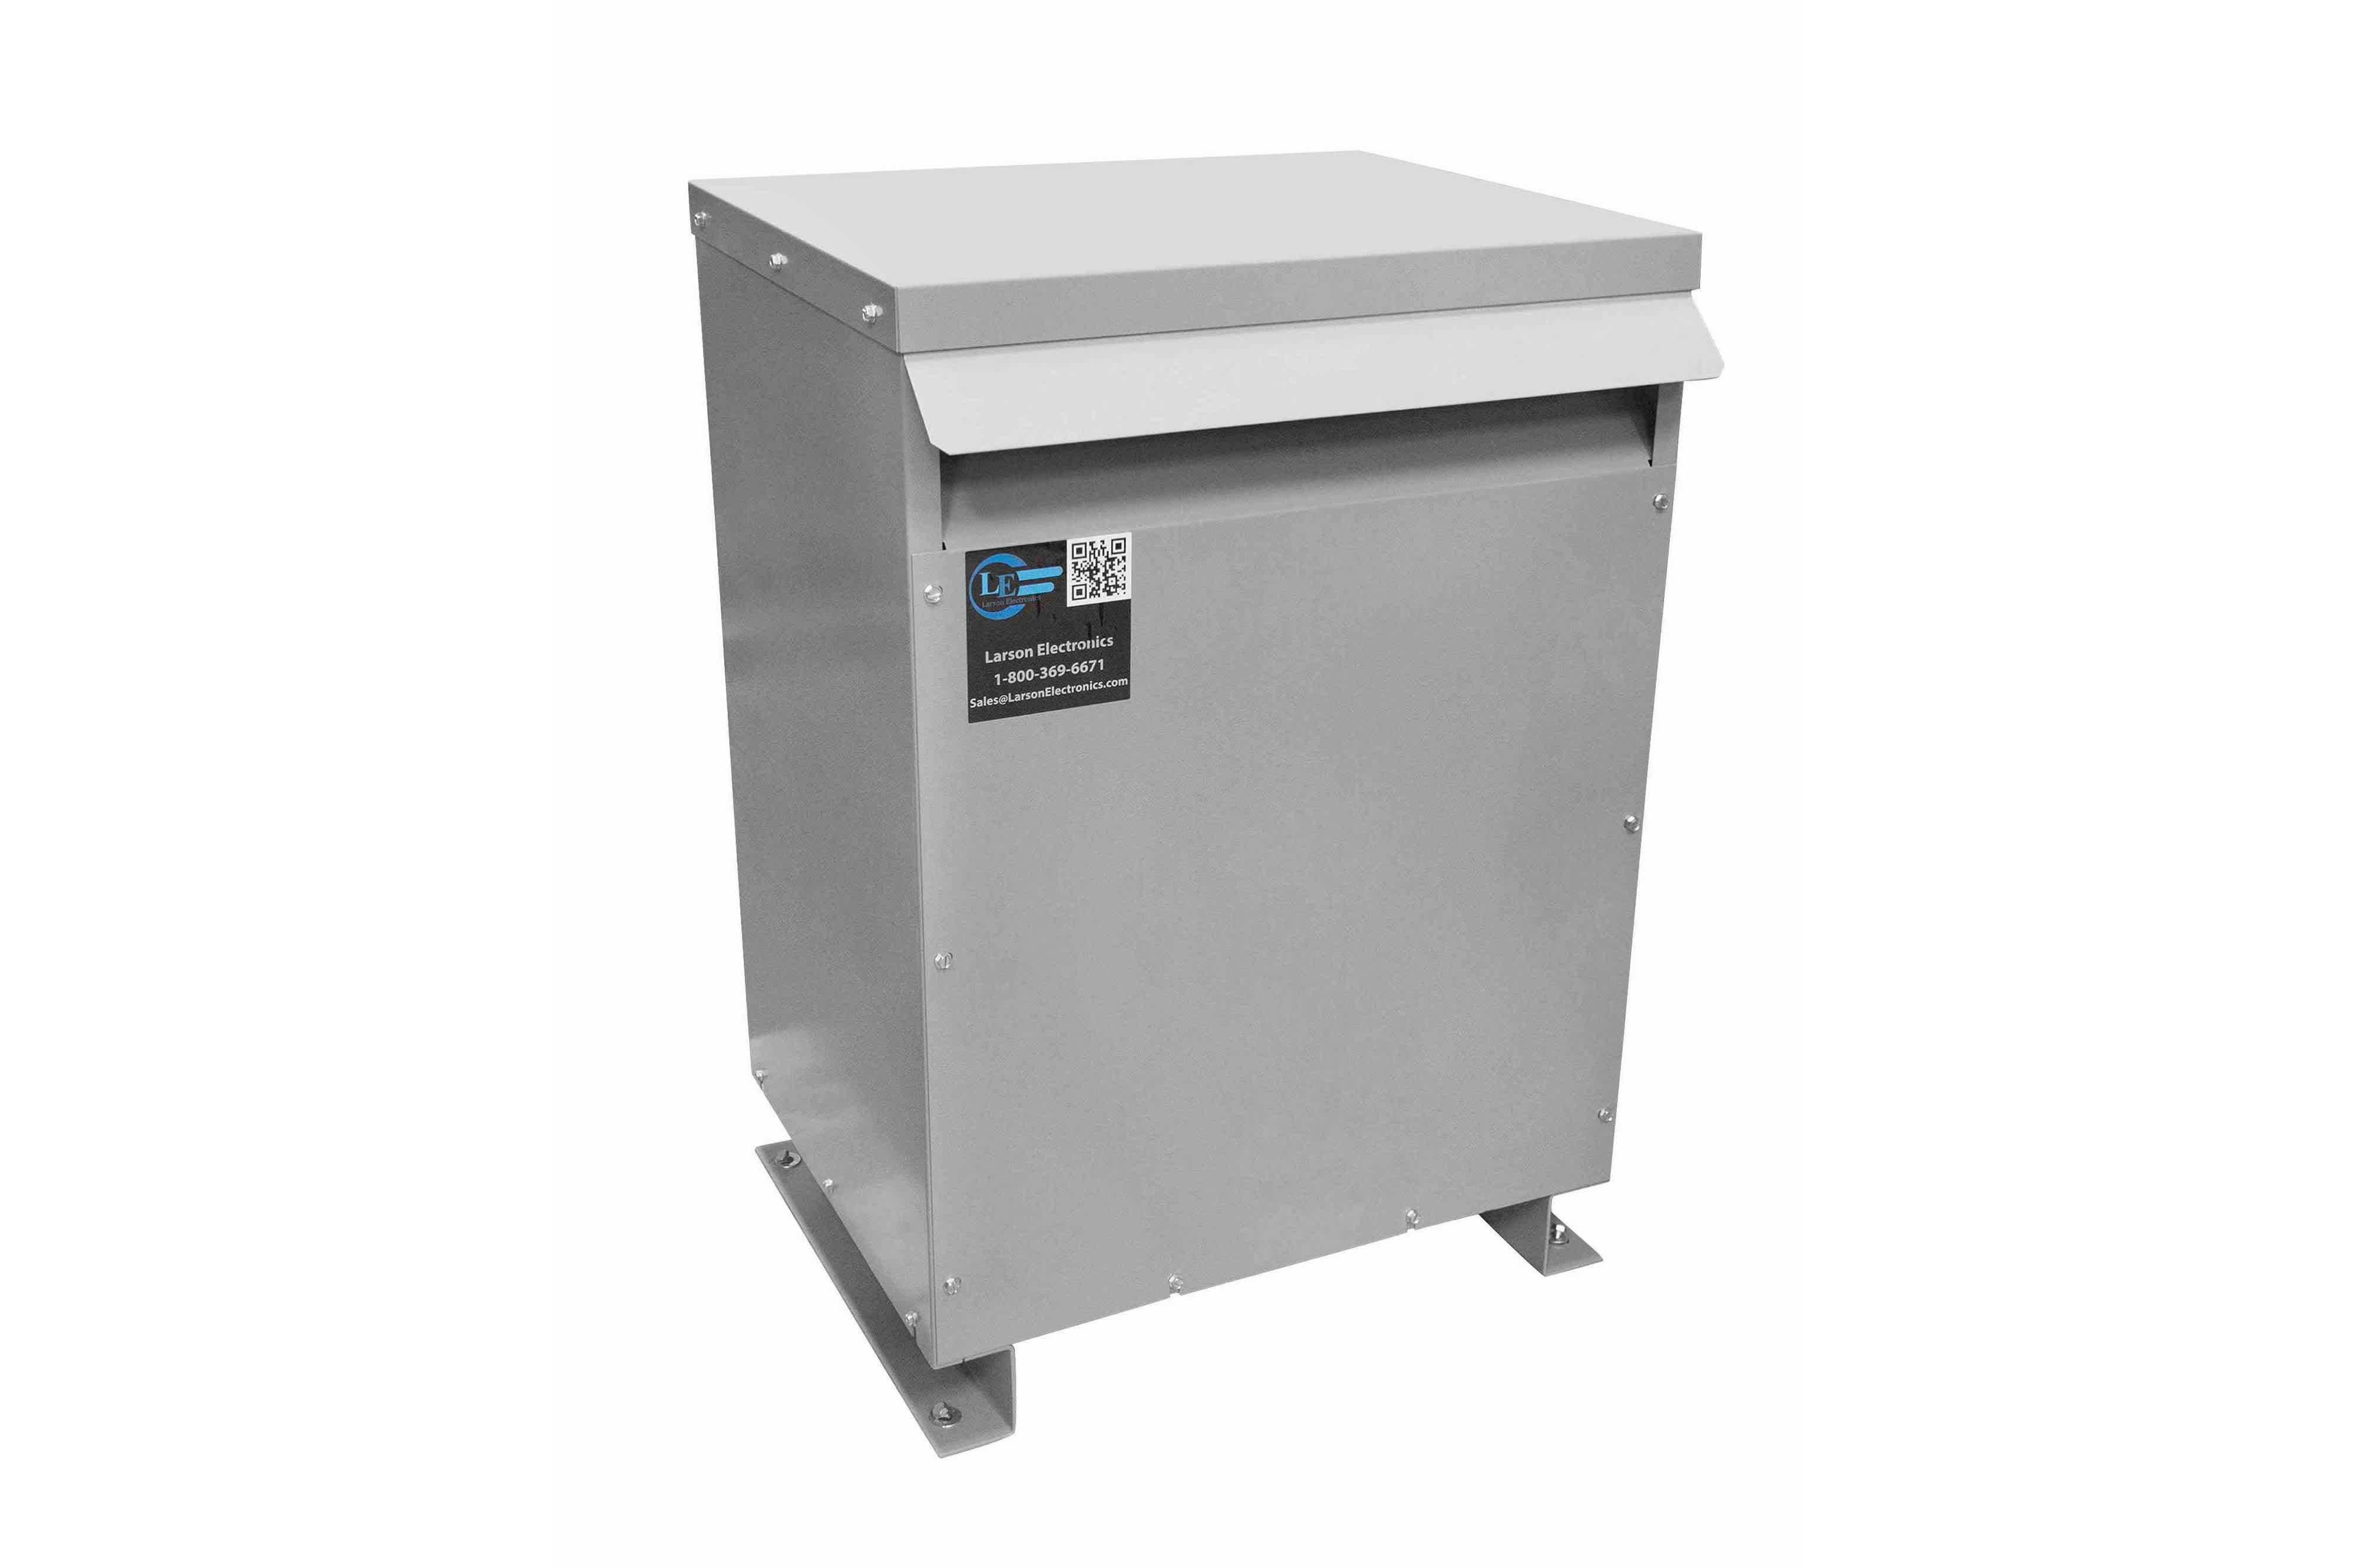 100 kVA 3PH DOE Transformer, 220V Delta Primary, 208Y/120 Wye-N Secondary, N3R, Ventilated, 60 Hz